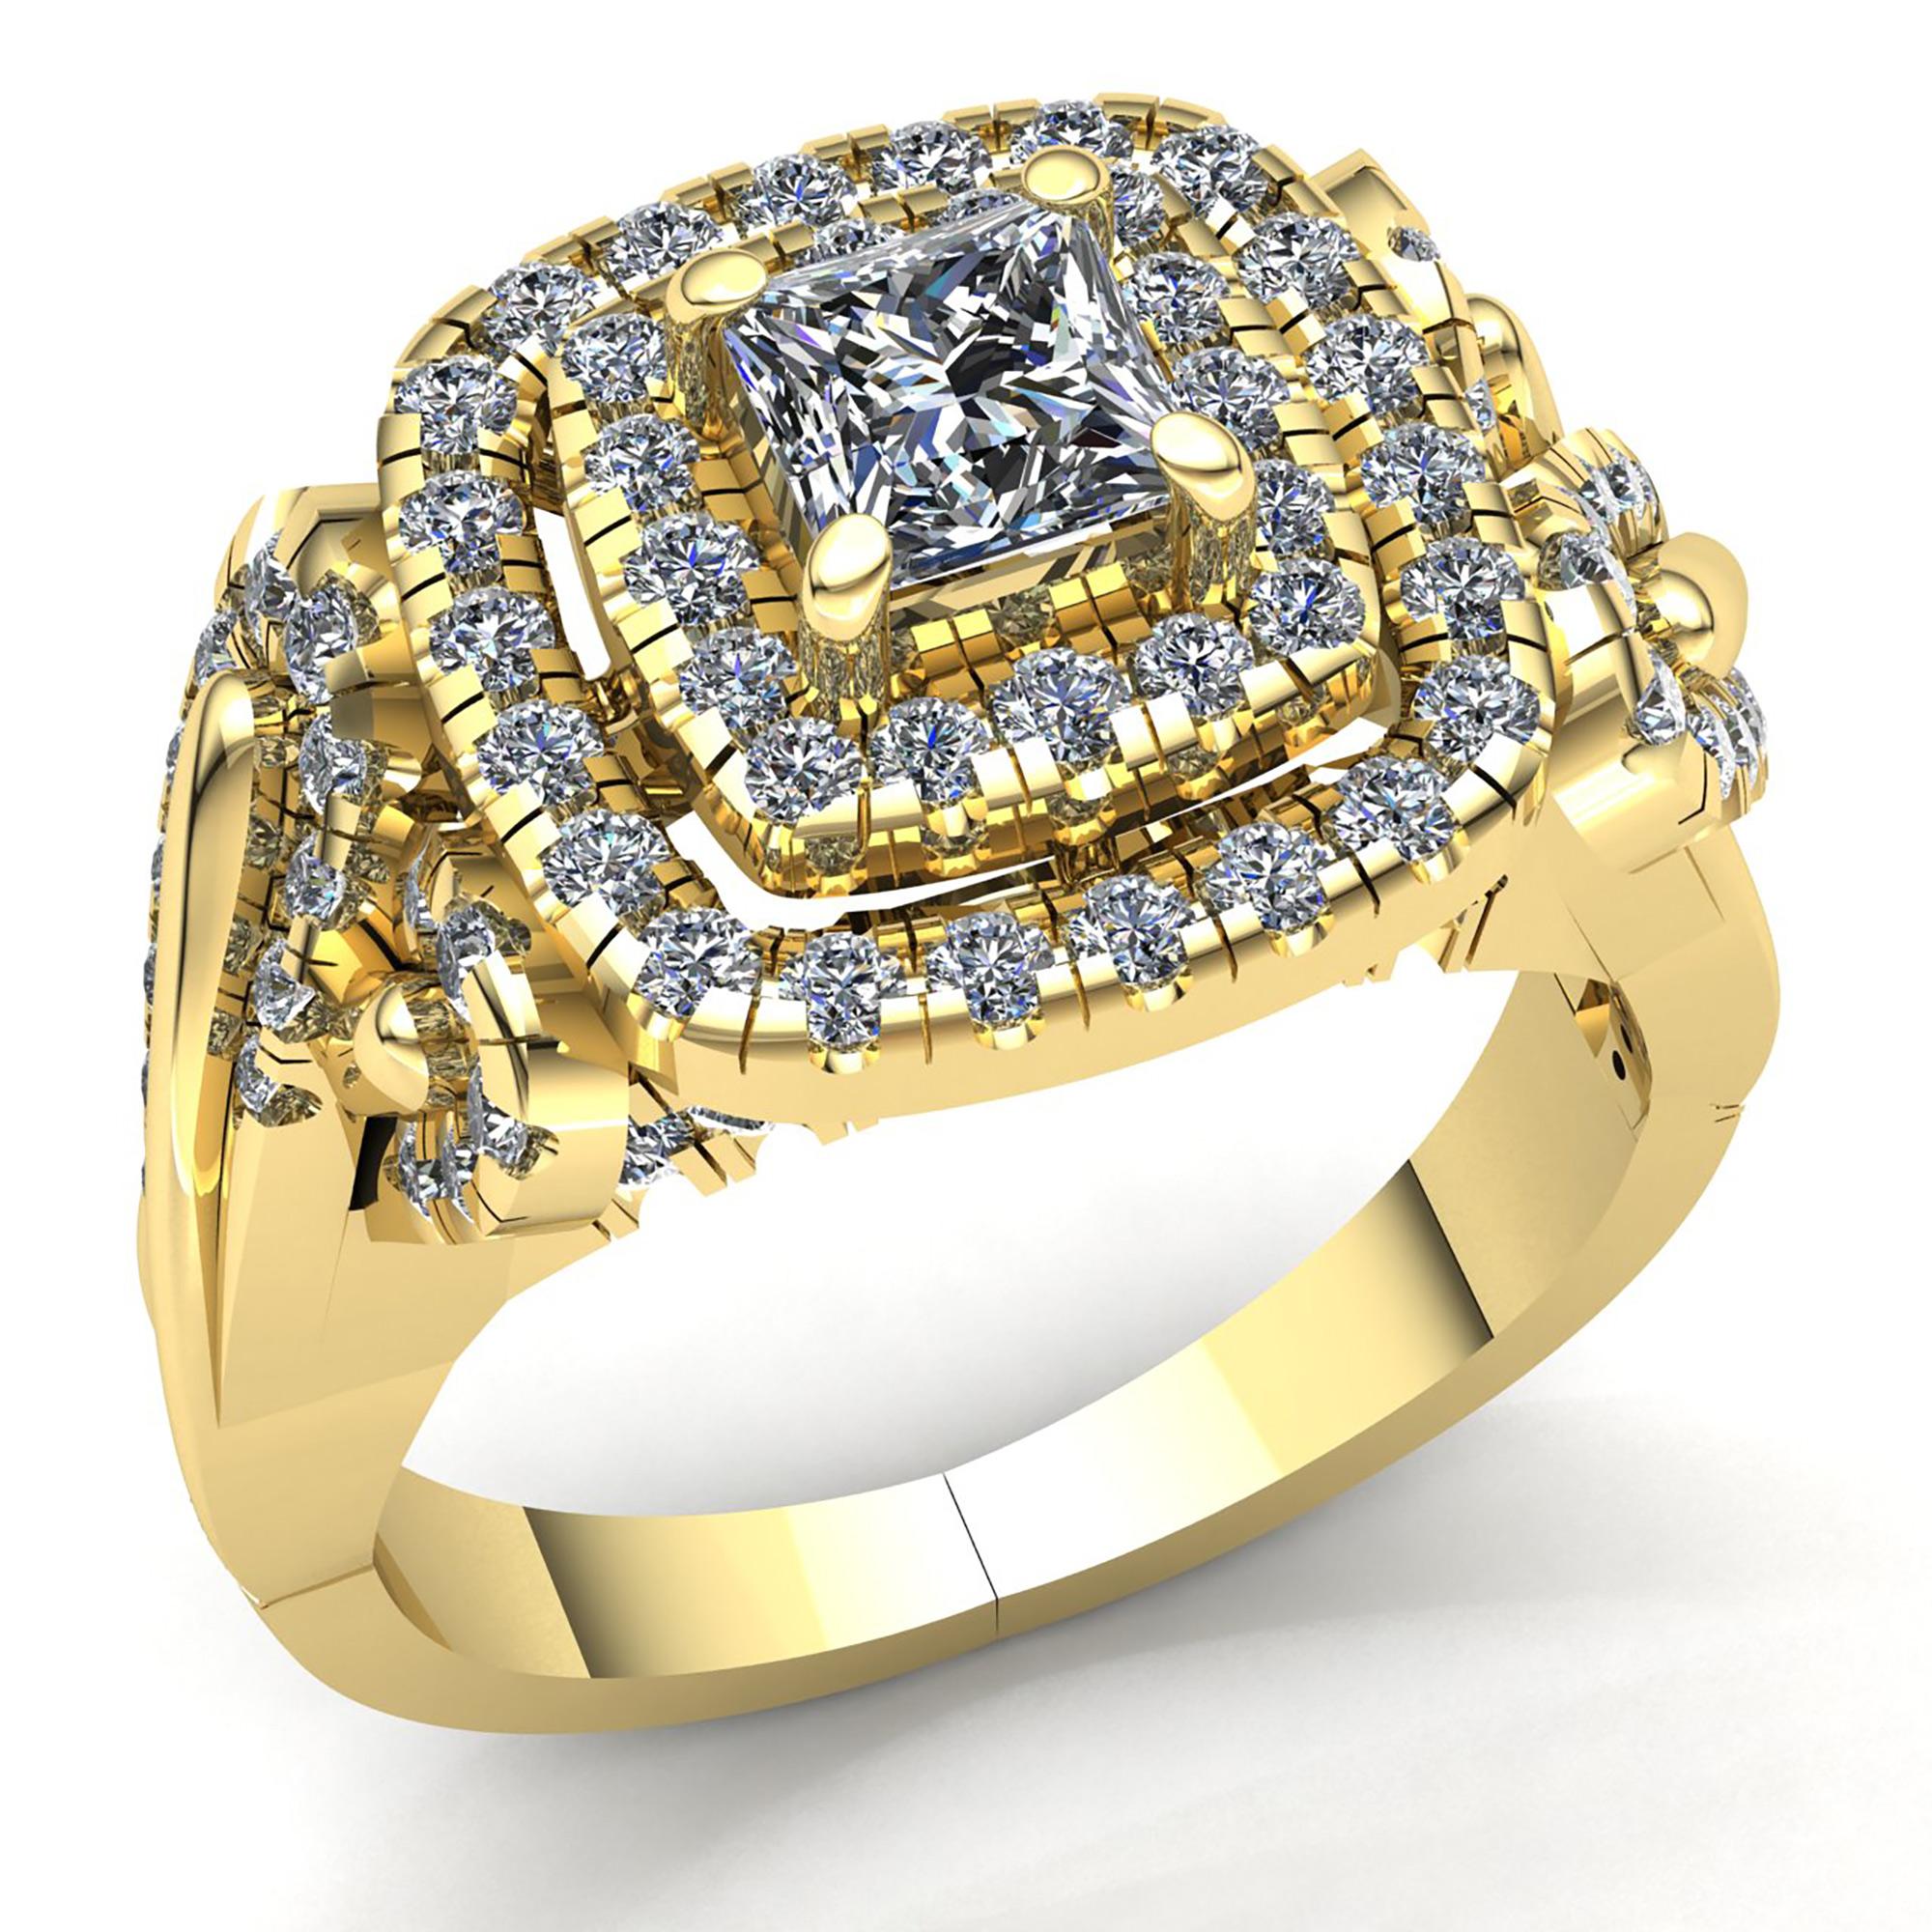 genuine 3ct princess cut diamond ladies double halo engagement ring 18k gold ebay. Black Bedroom Furniture Sets. Home Design Ideas